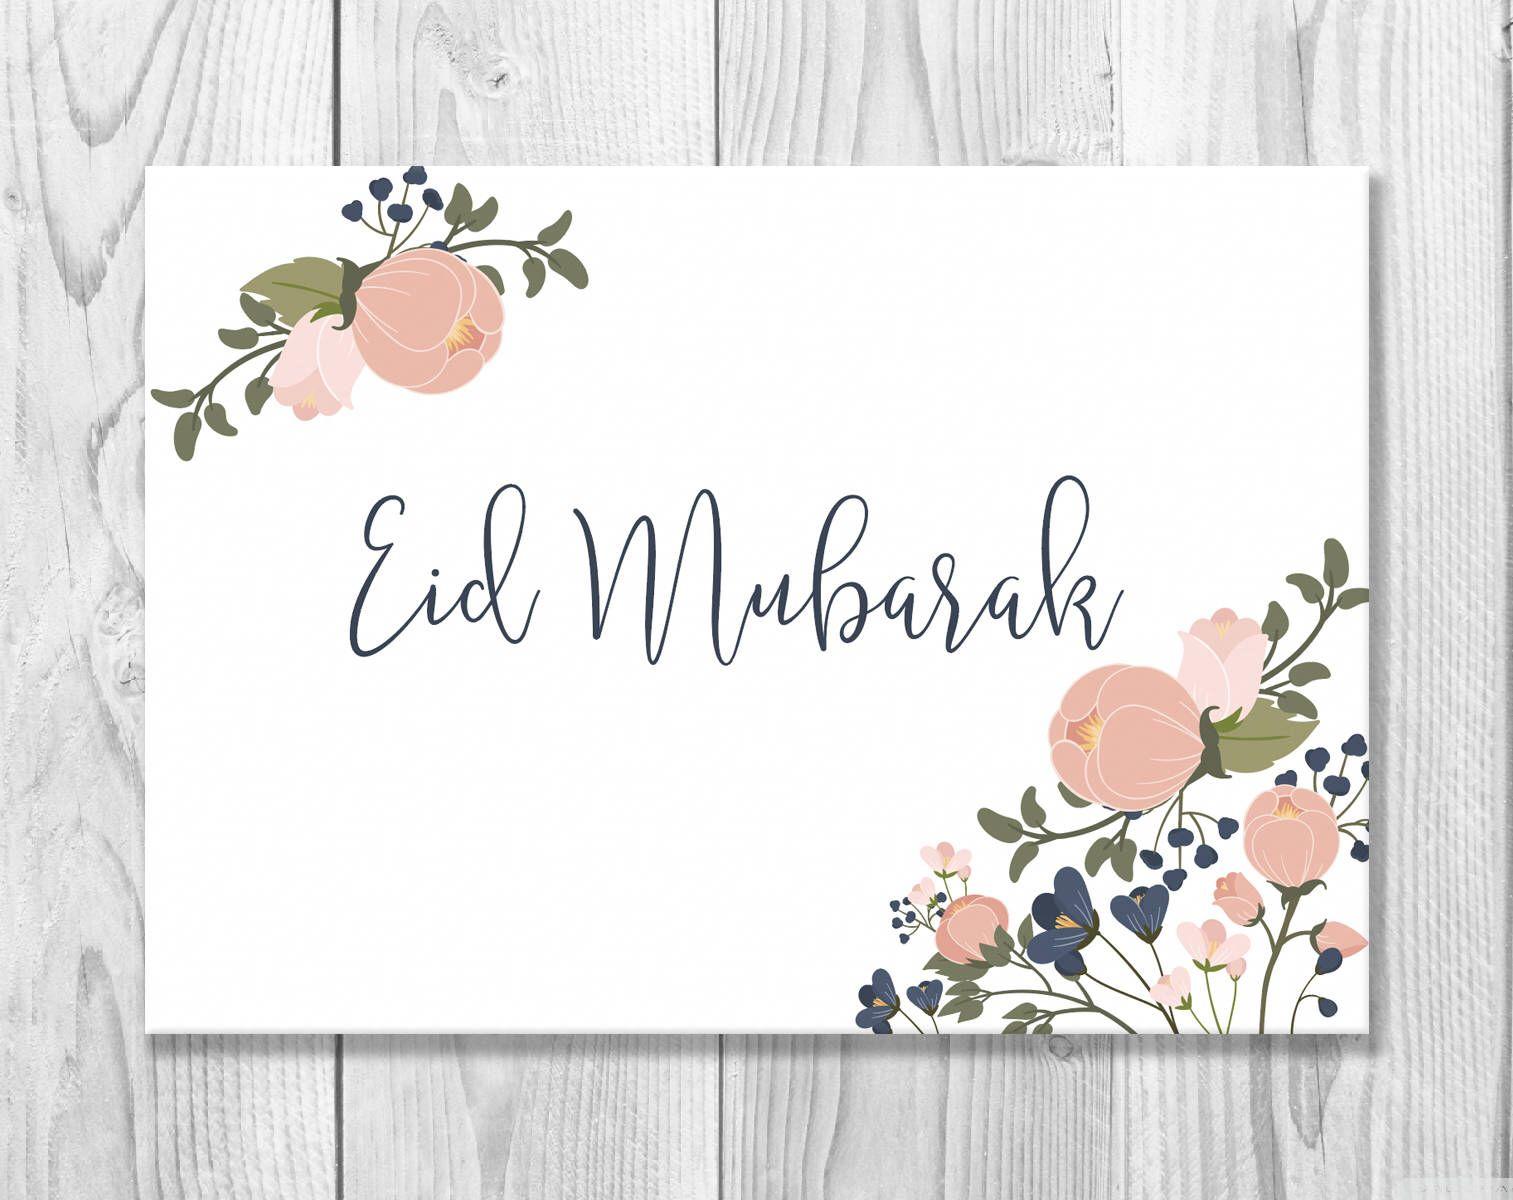 Printable Eid Mubarak Card Eid Greeting Card Happy Eid Islamic Cards Muslim Cards Islamic Greetings Instant Download Idul Fitri Kartu Pernikahan Kartu